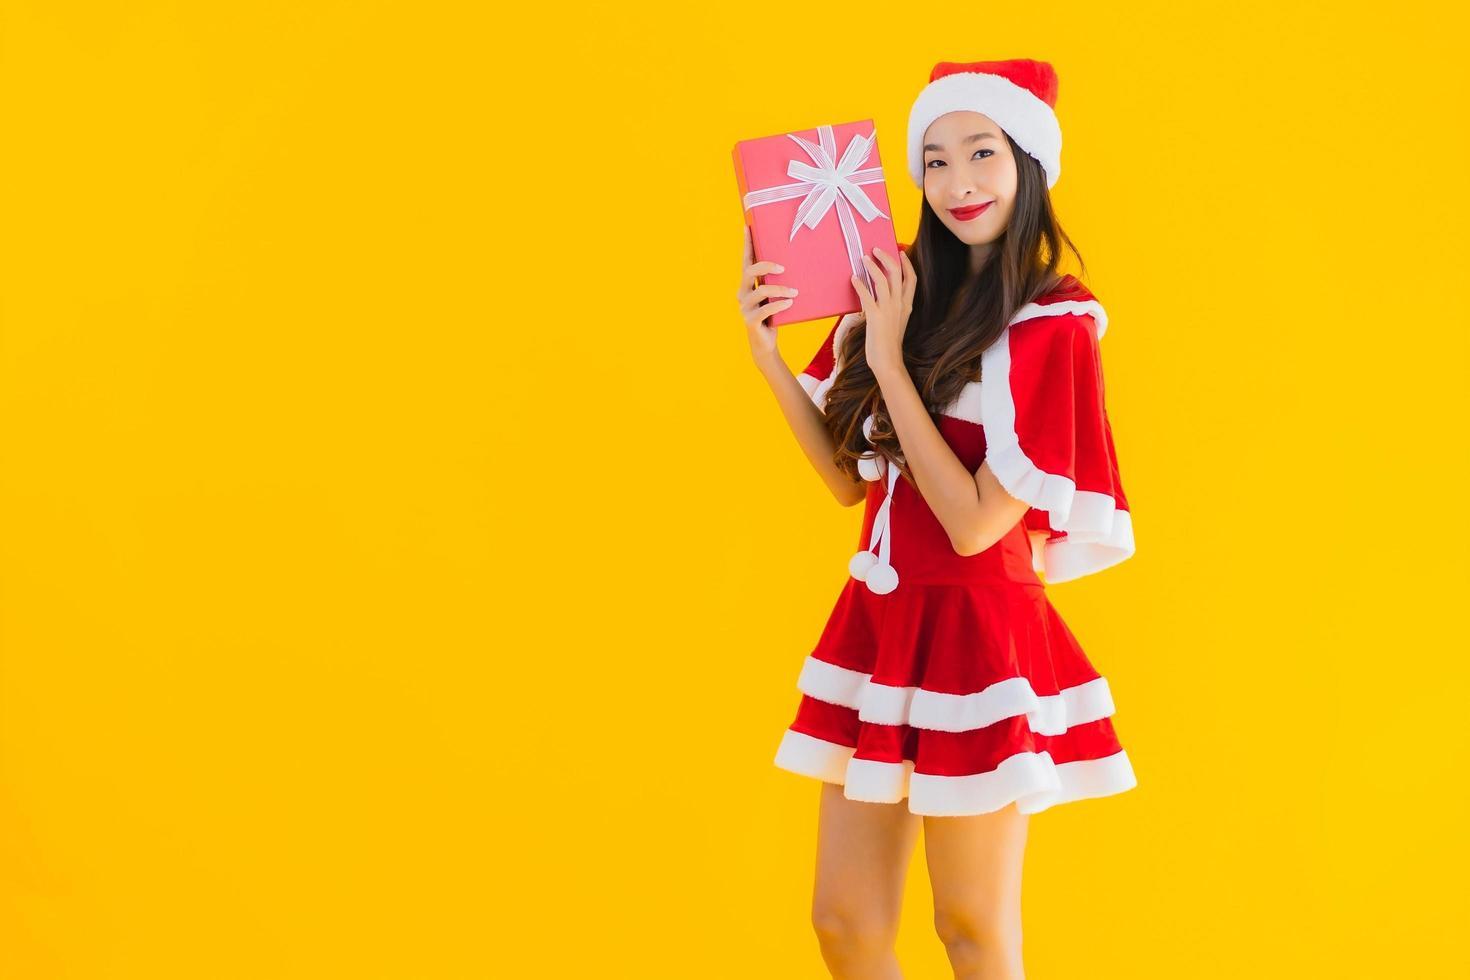 Portrait of woman wearing Santa costume photo